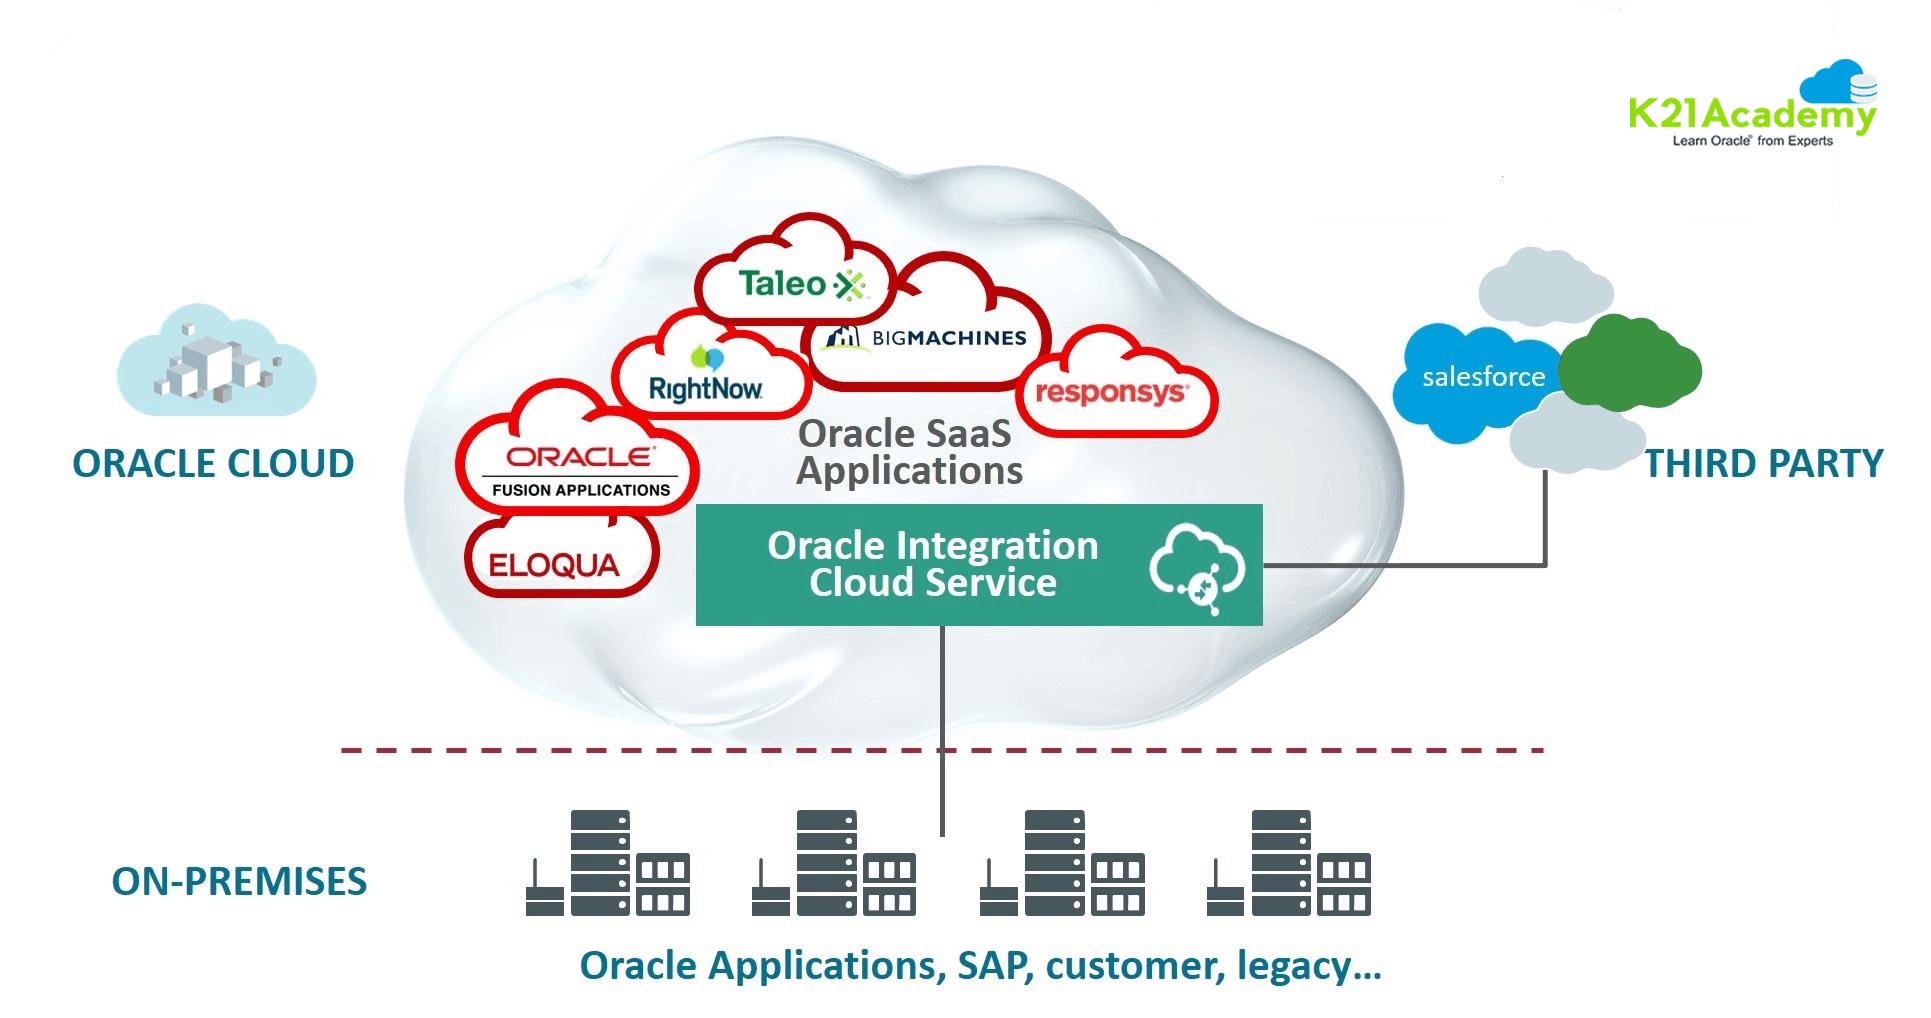 soa cs oic saas paas cloud integartion oracle vs advantages APIs